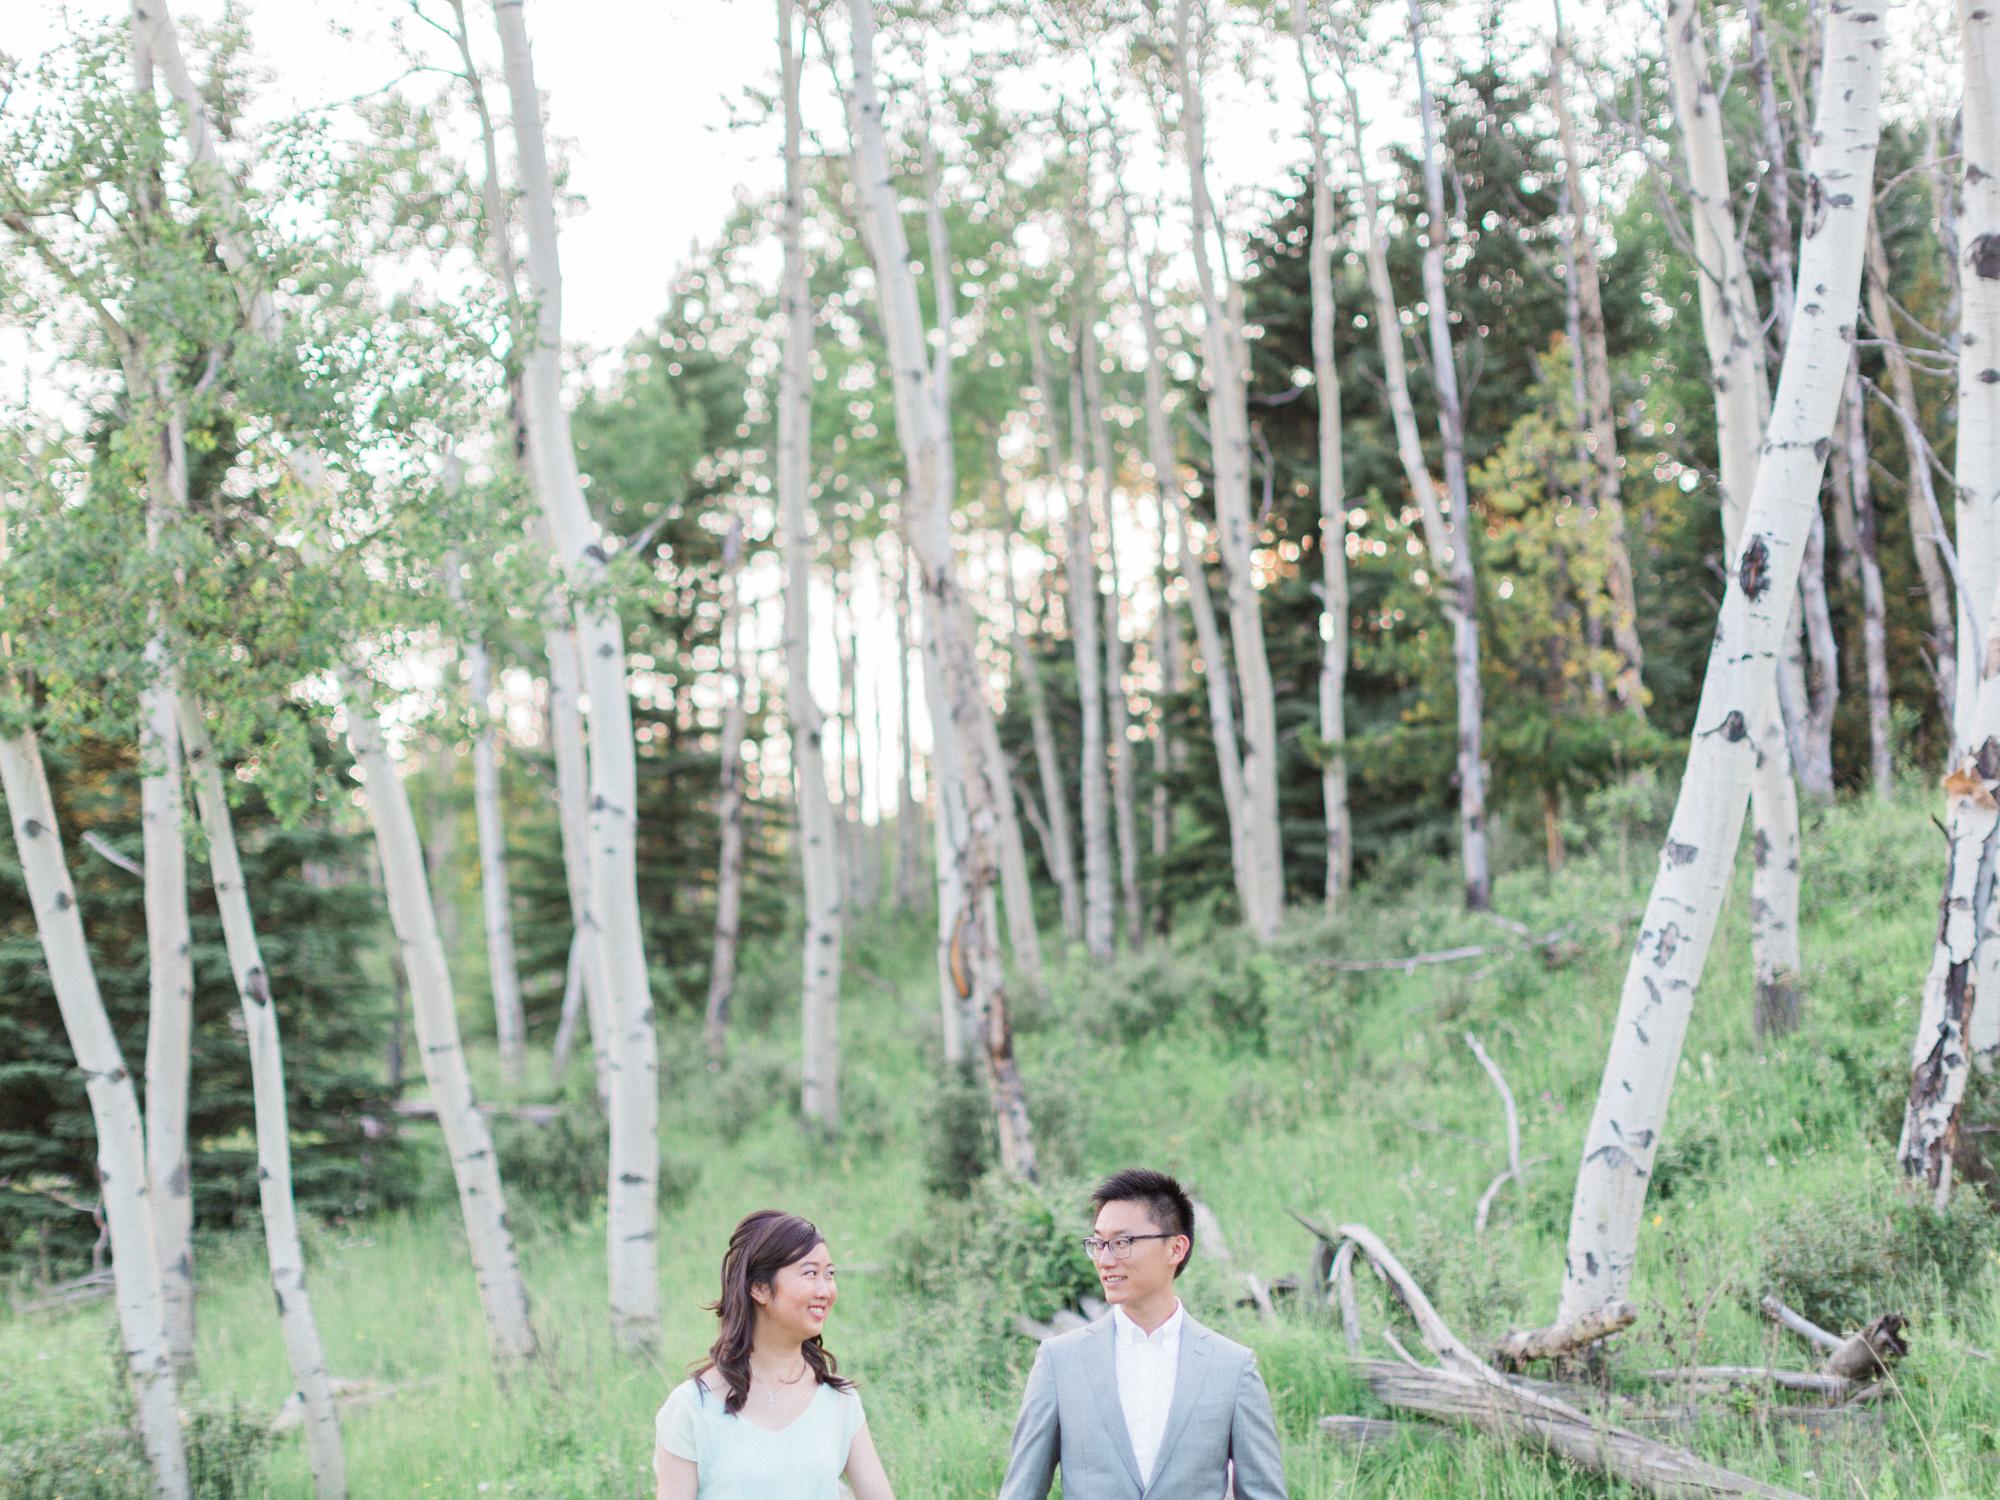 Calgary-Engagement-Photograher-Kananaskis-Country-7.jpg